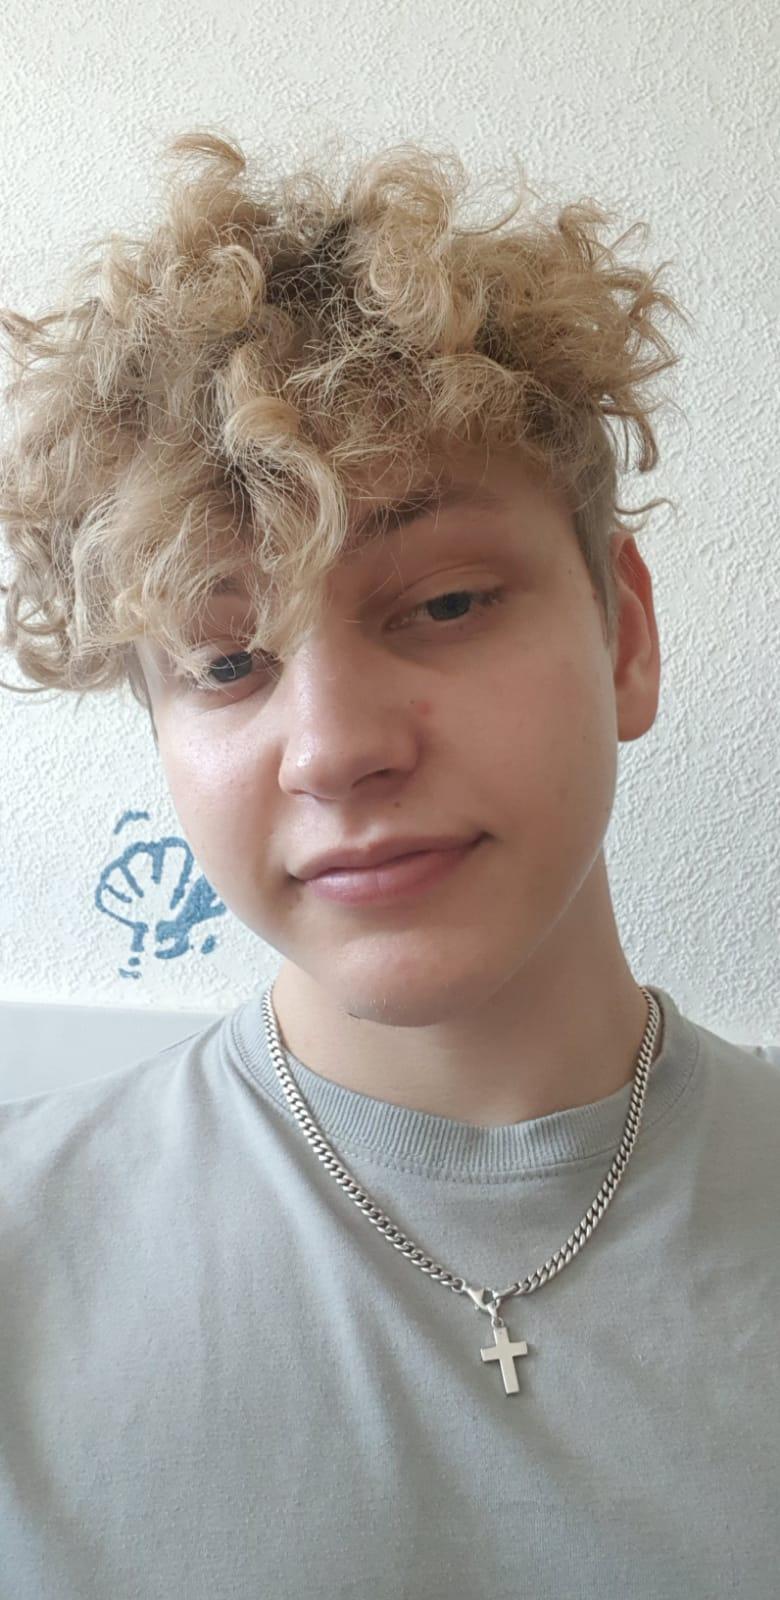 Nikita Schimpf, 17 let, Wittmund